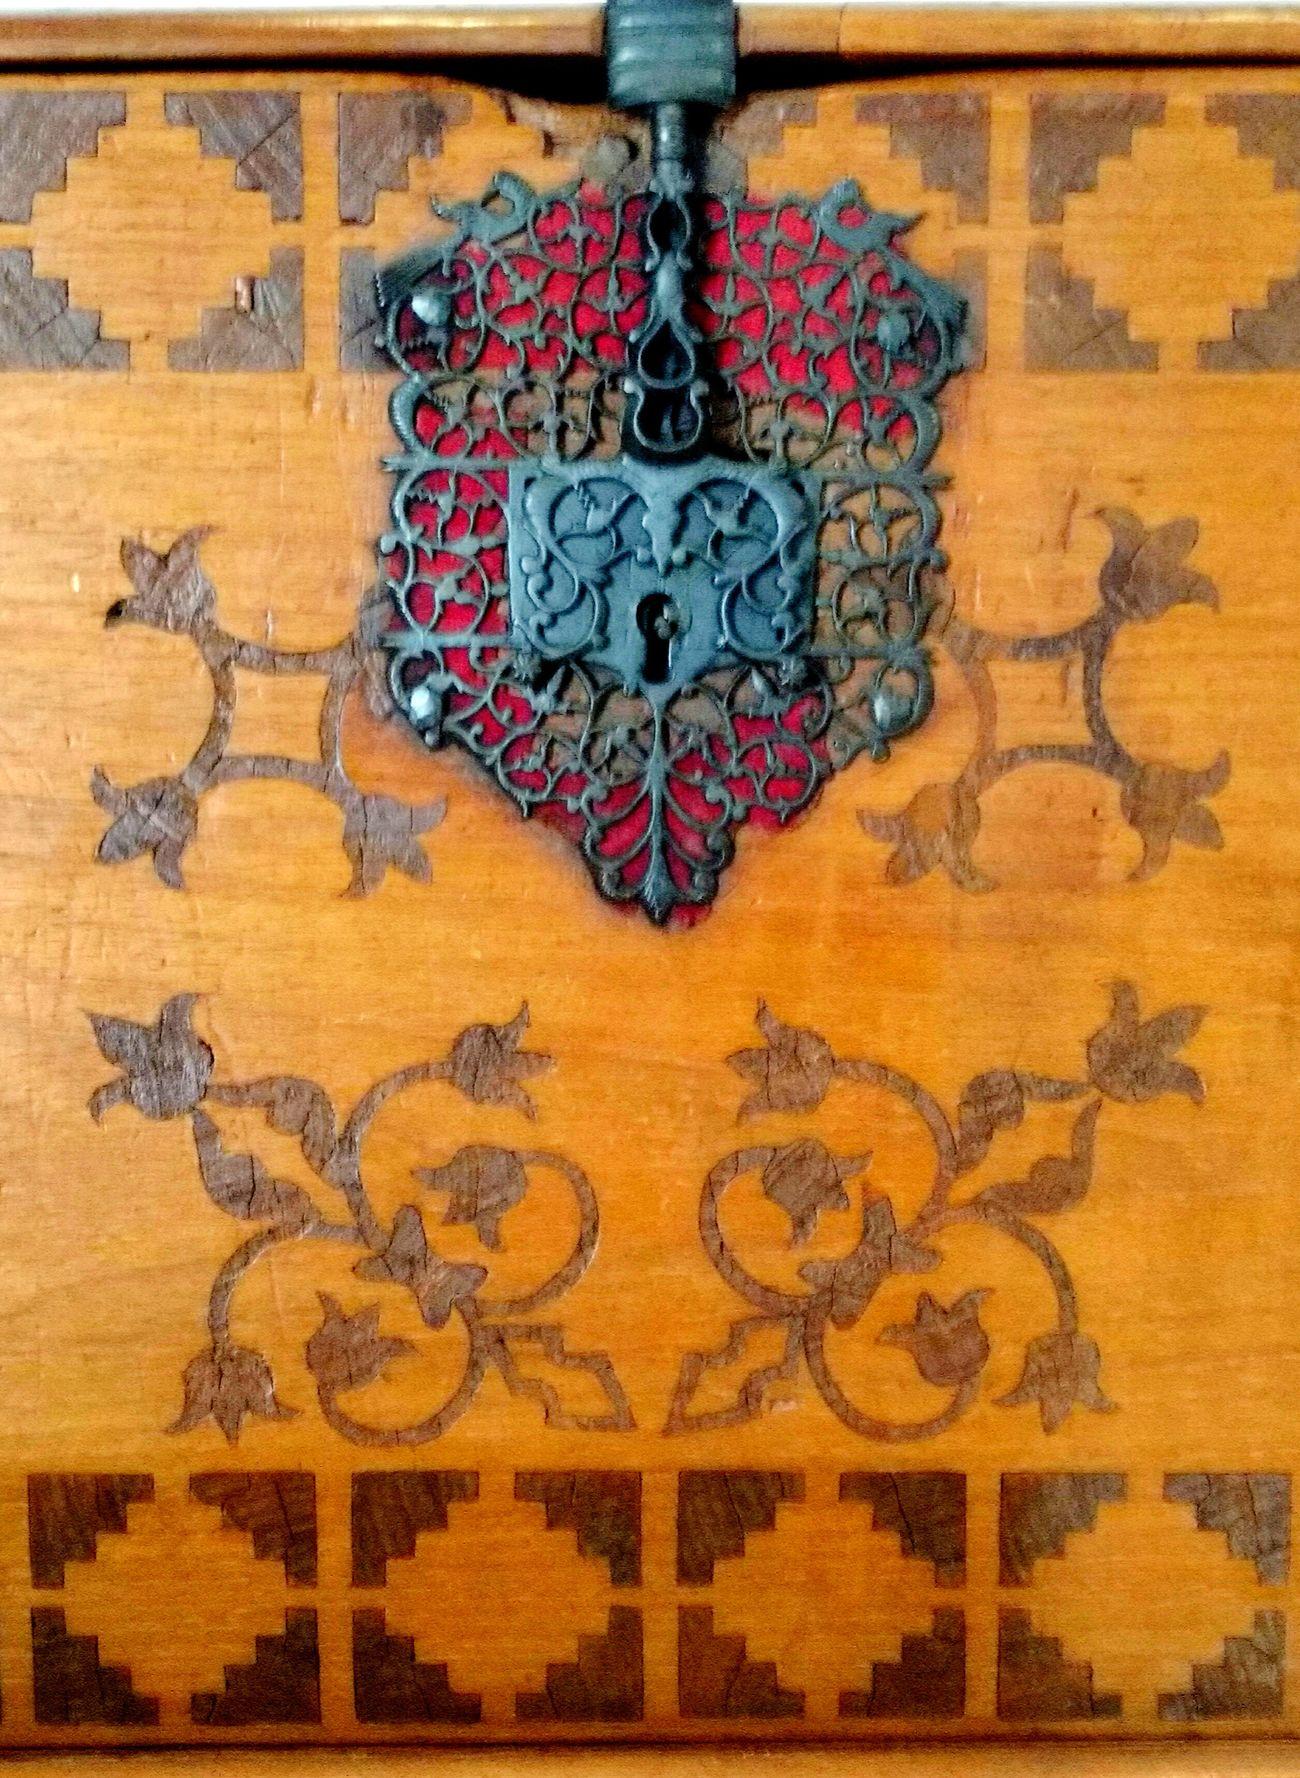 ArtWork Art And Craft Barroco Wooden Art Wooden Chest